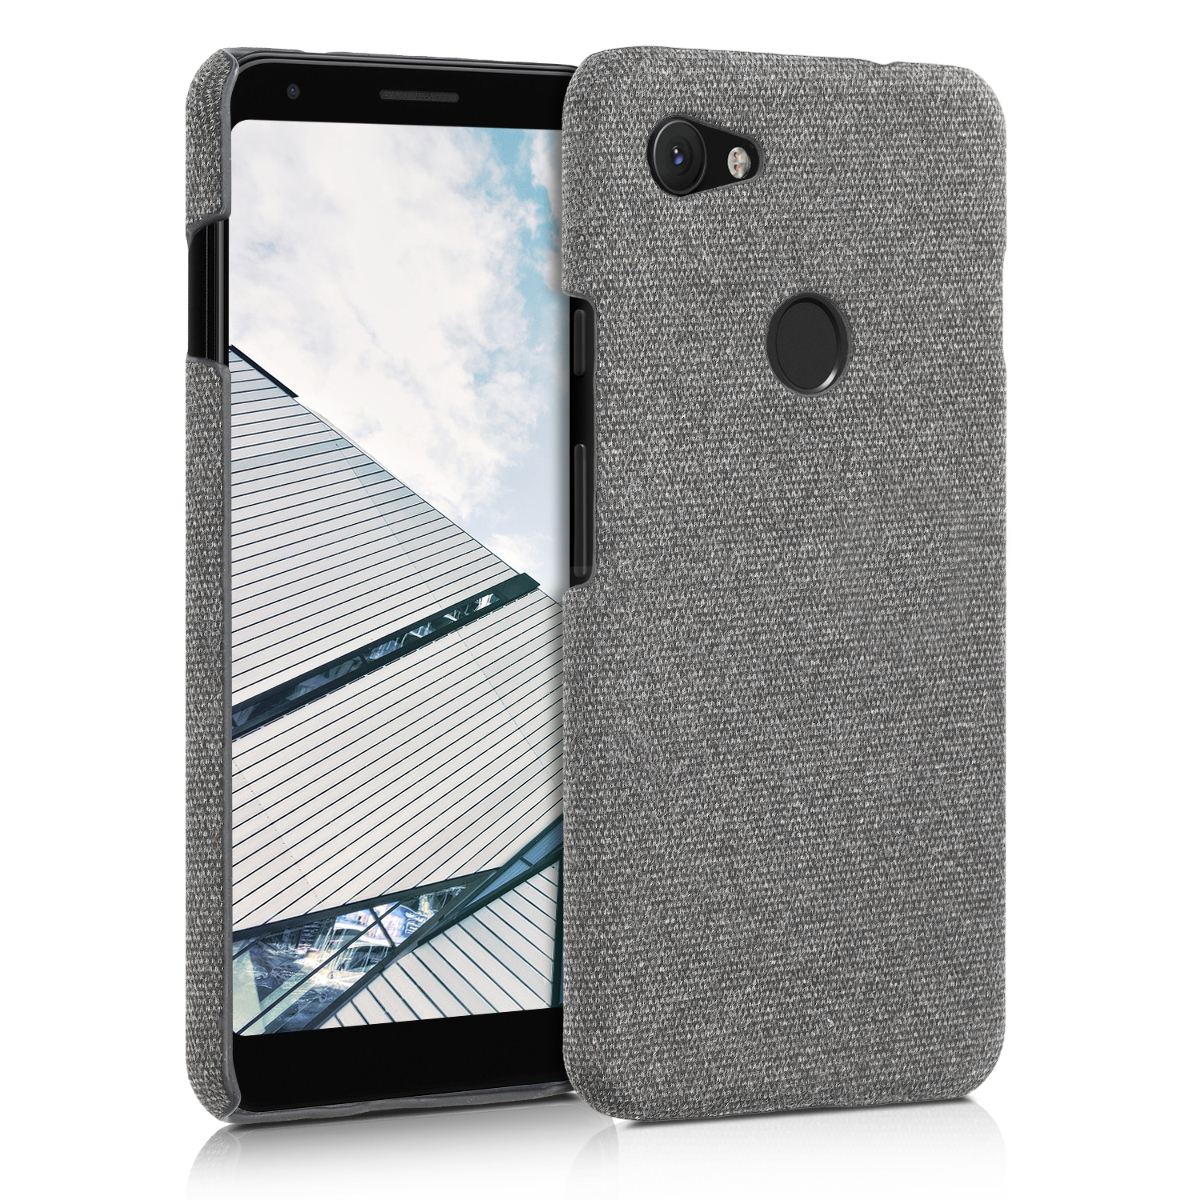 KW Σκληρή Θήκη Google Pixel 3a XL - Light Grey (48735.25)